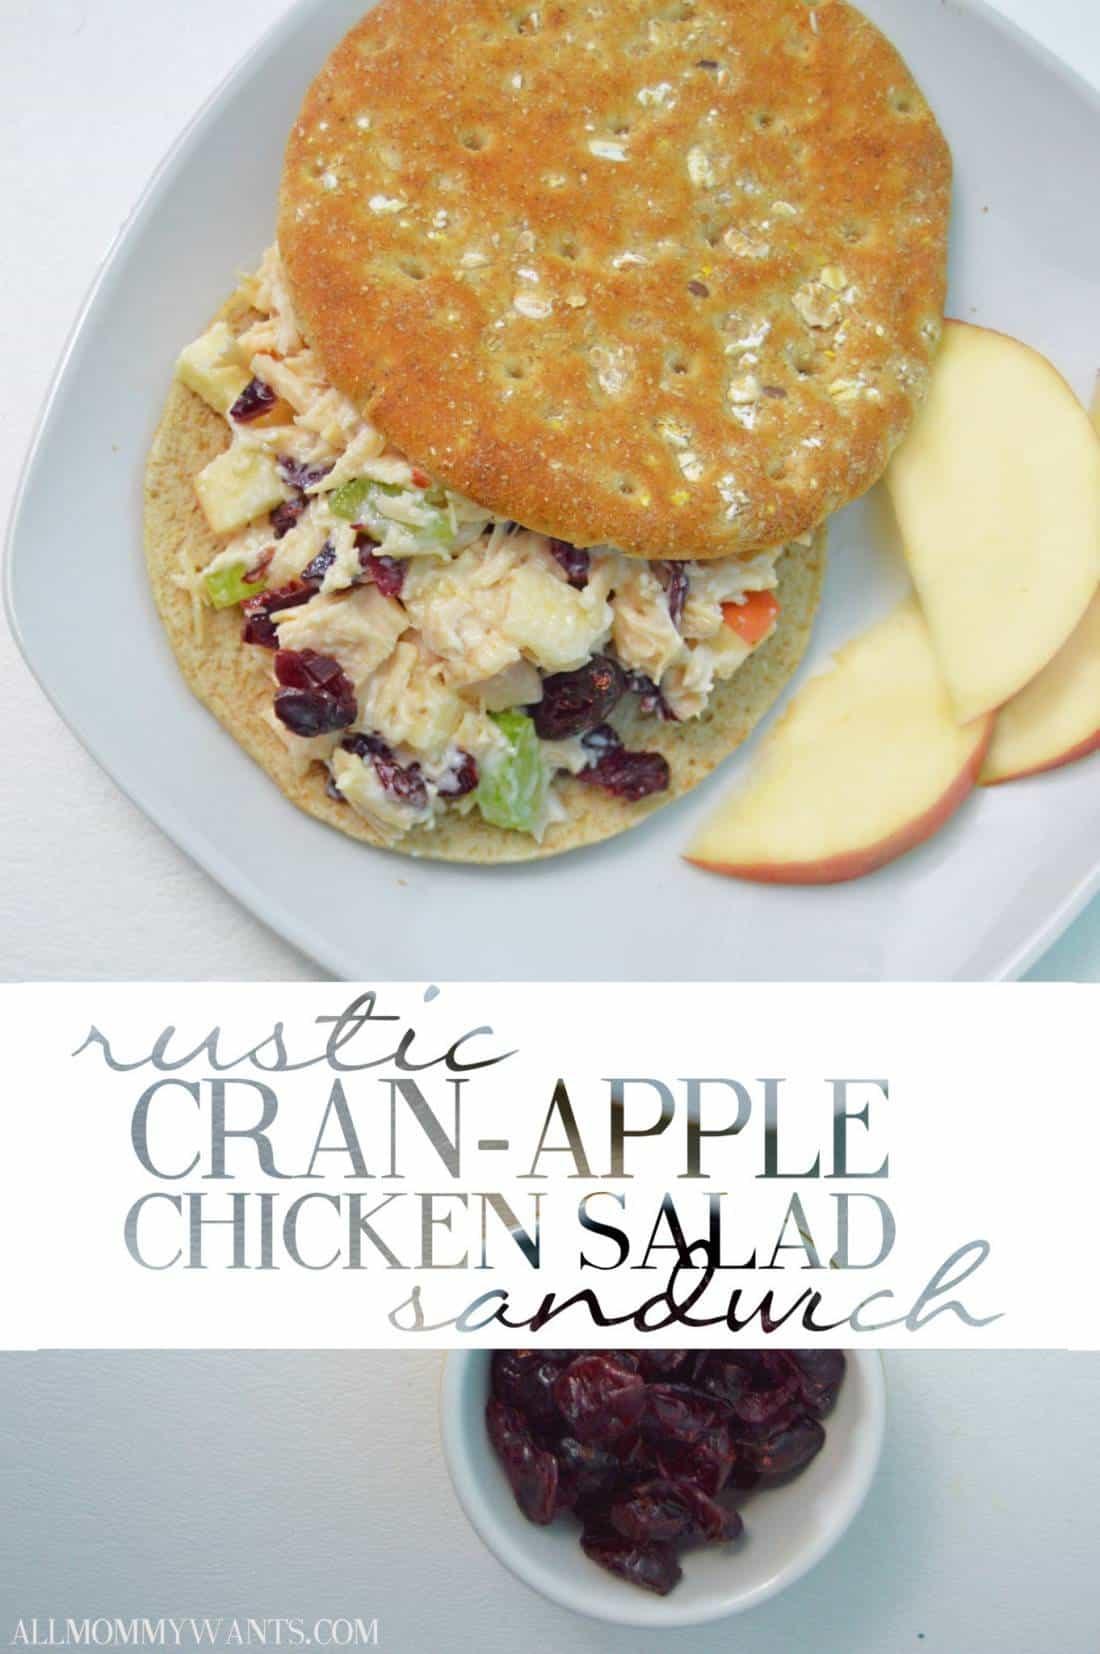 Recipe: Cran-apple Chicken Salad Sandwich